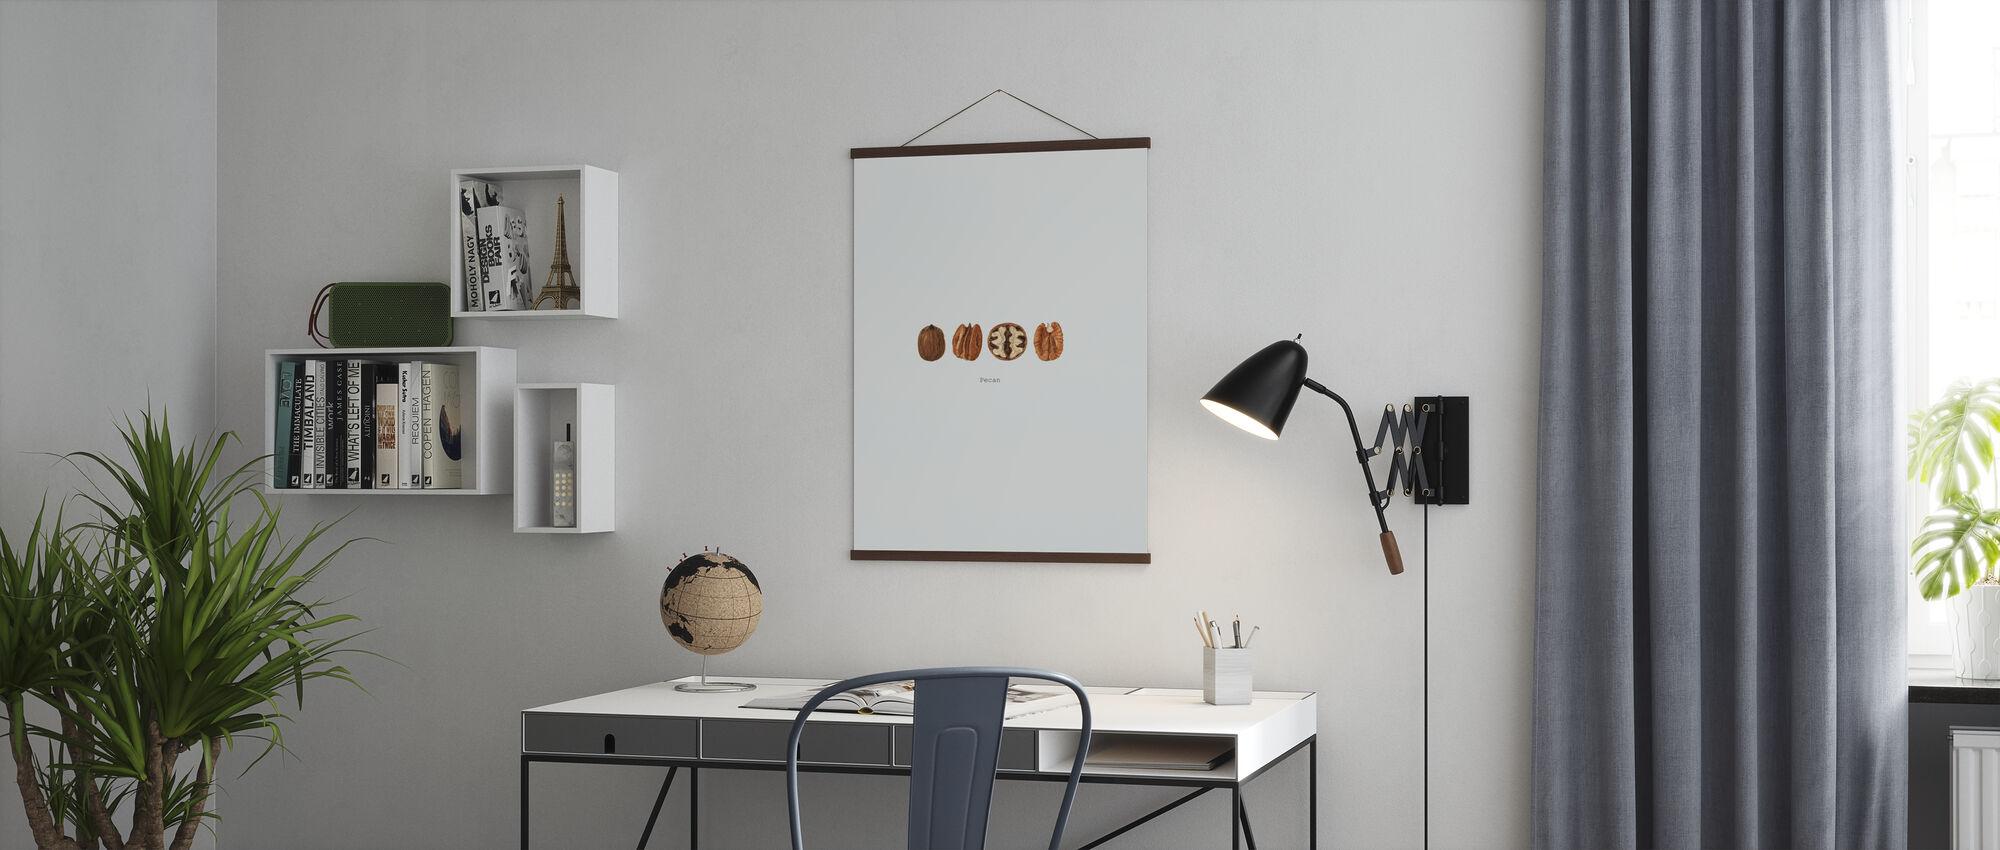 Pecan - Poster - Office